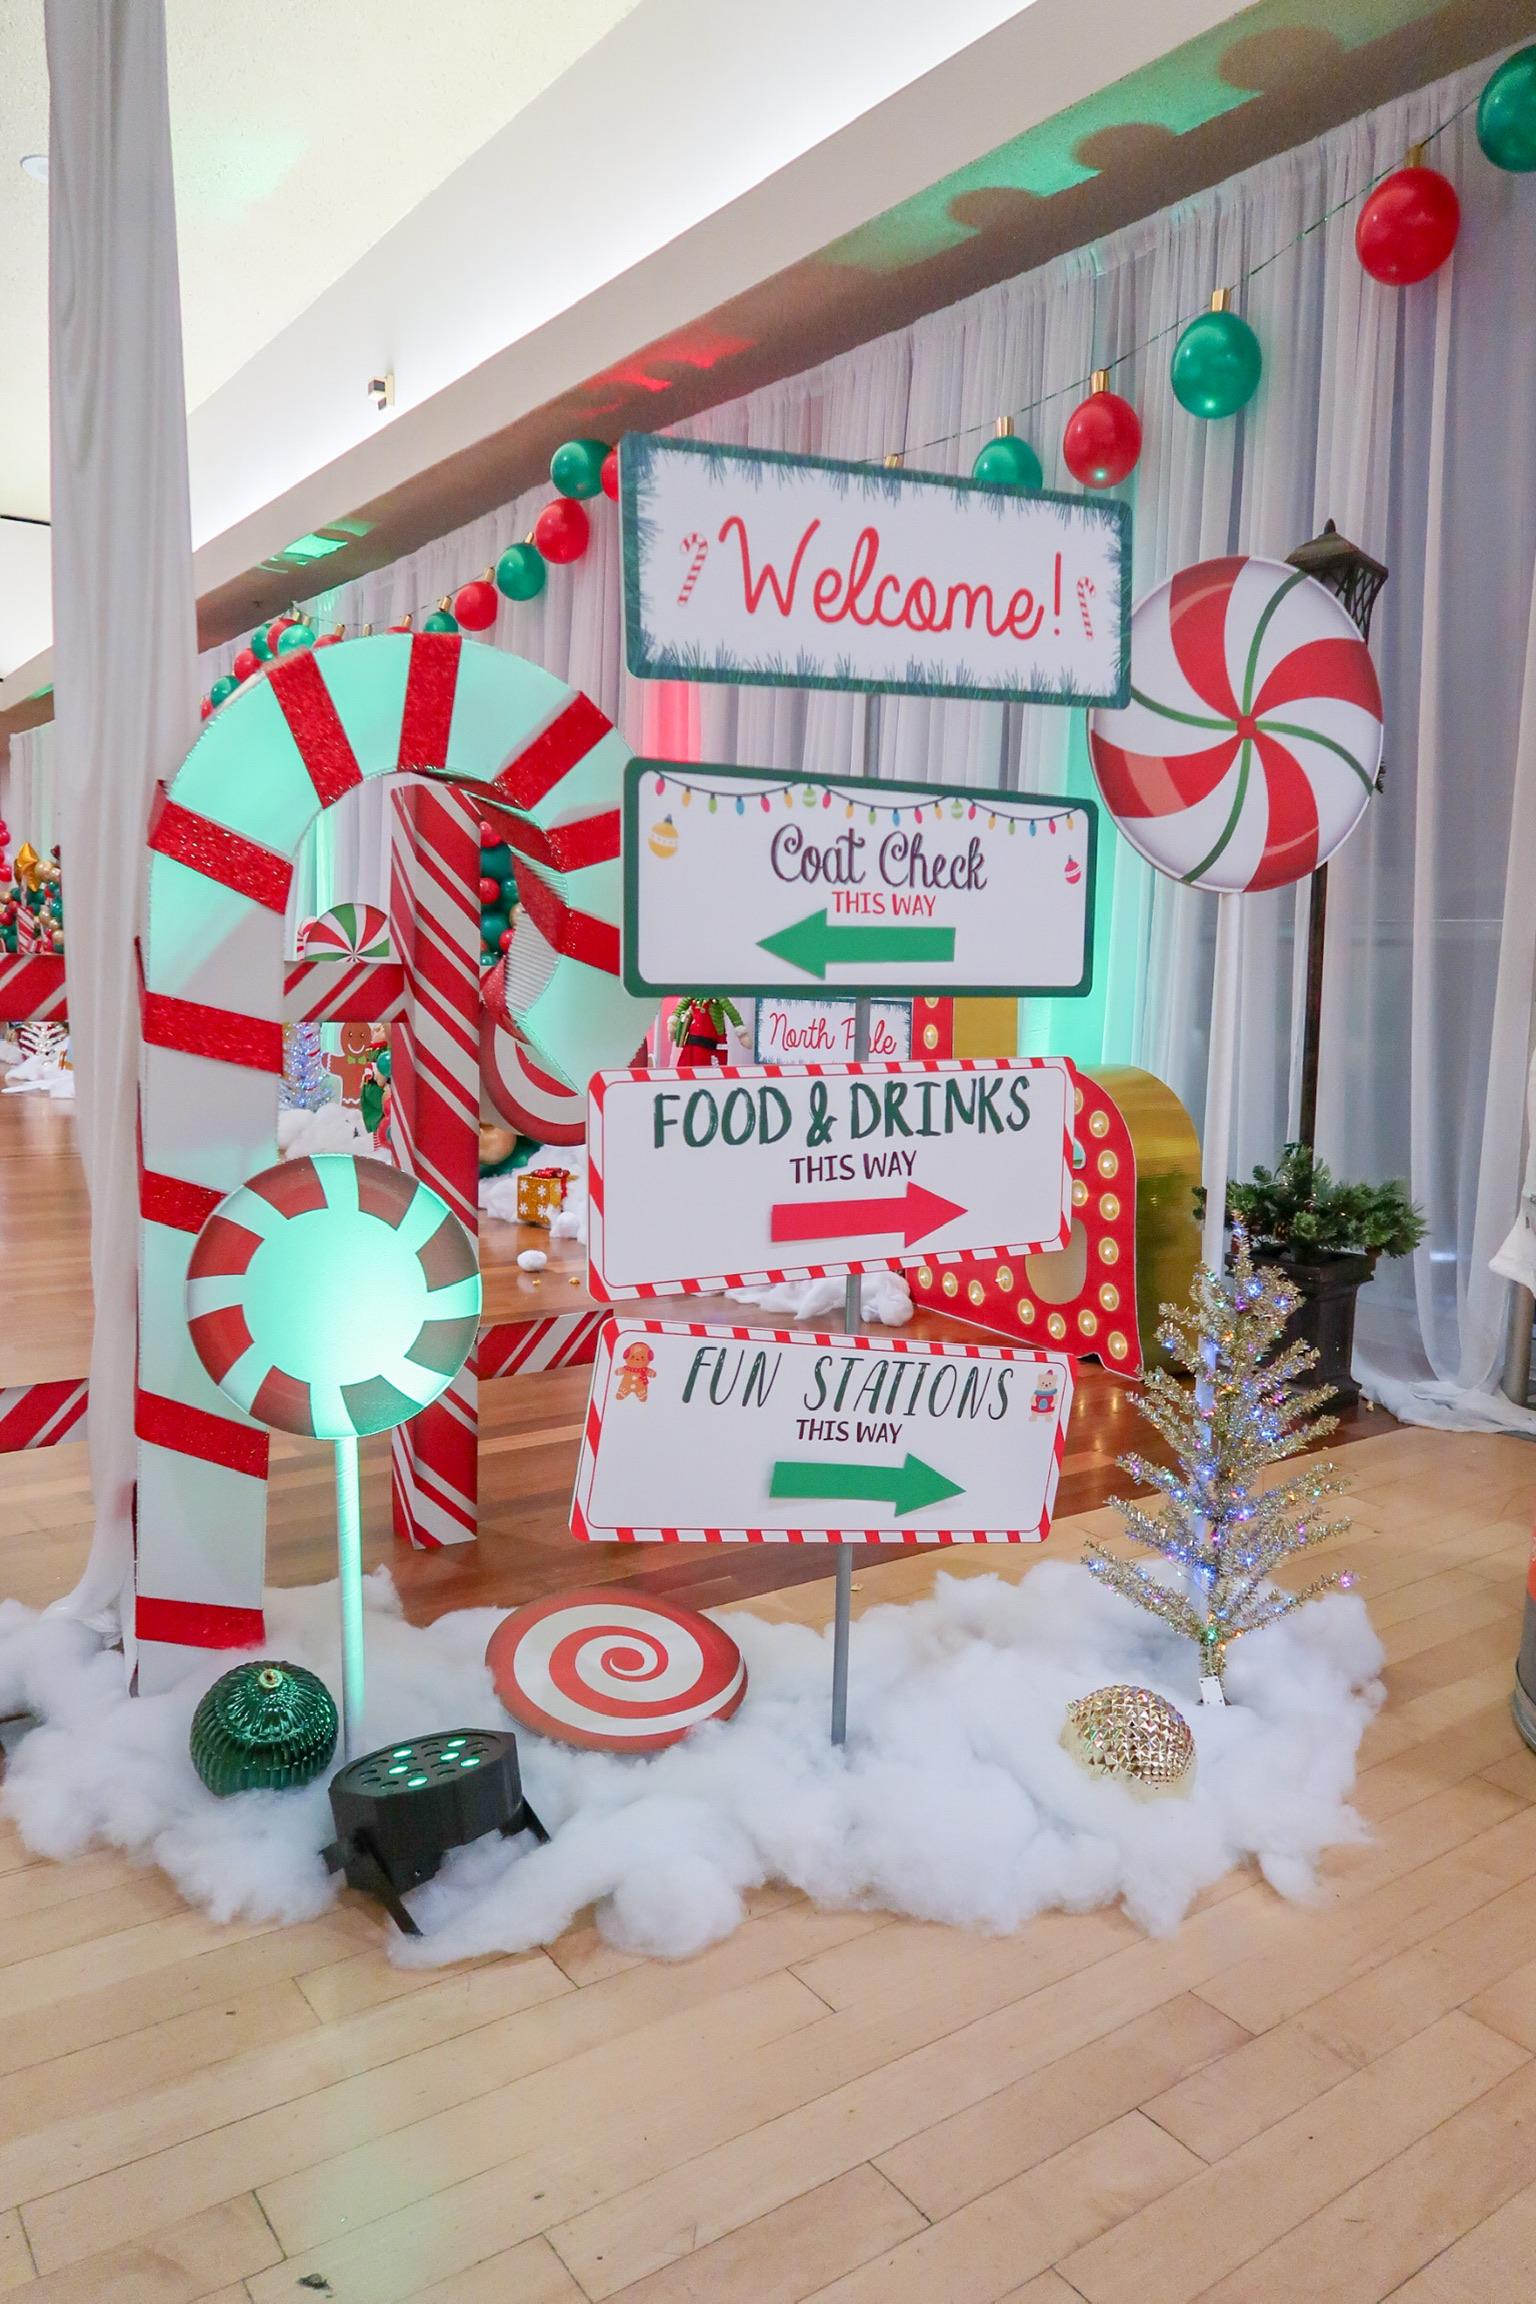 Sarsie's Parties 12-21-19 Jabil Christmas Party